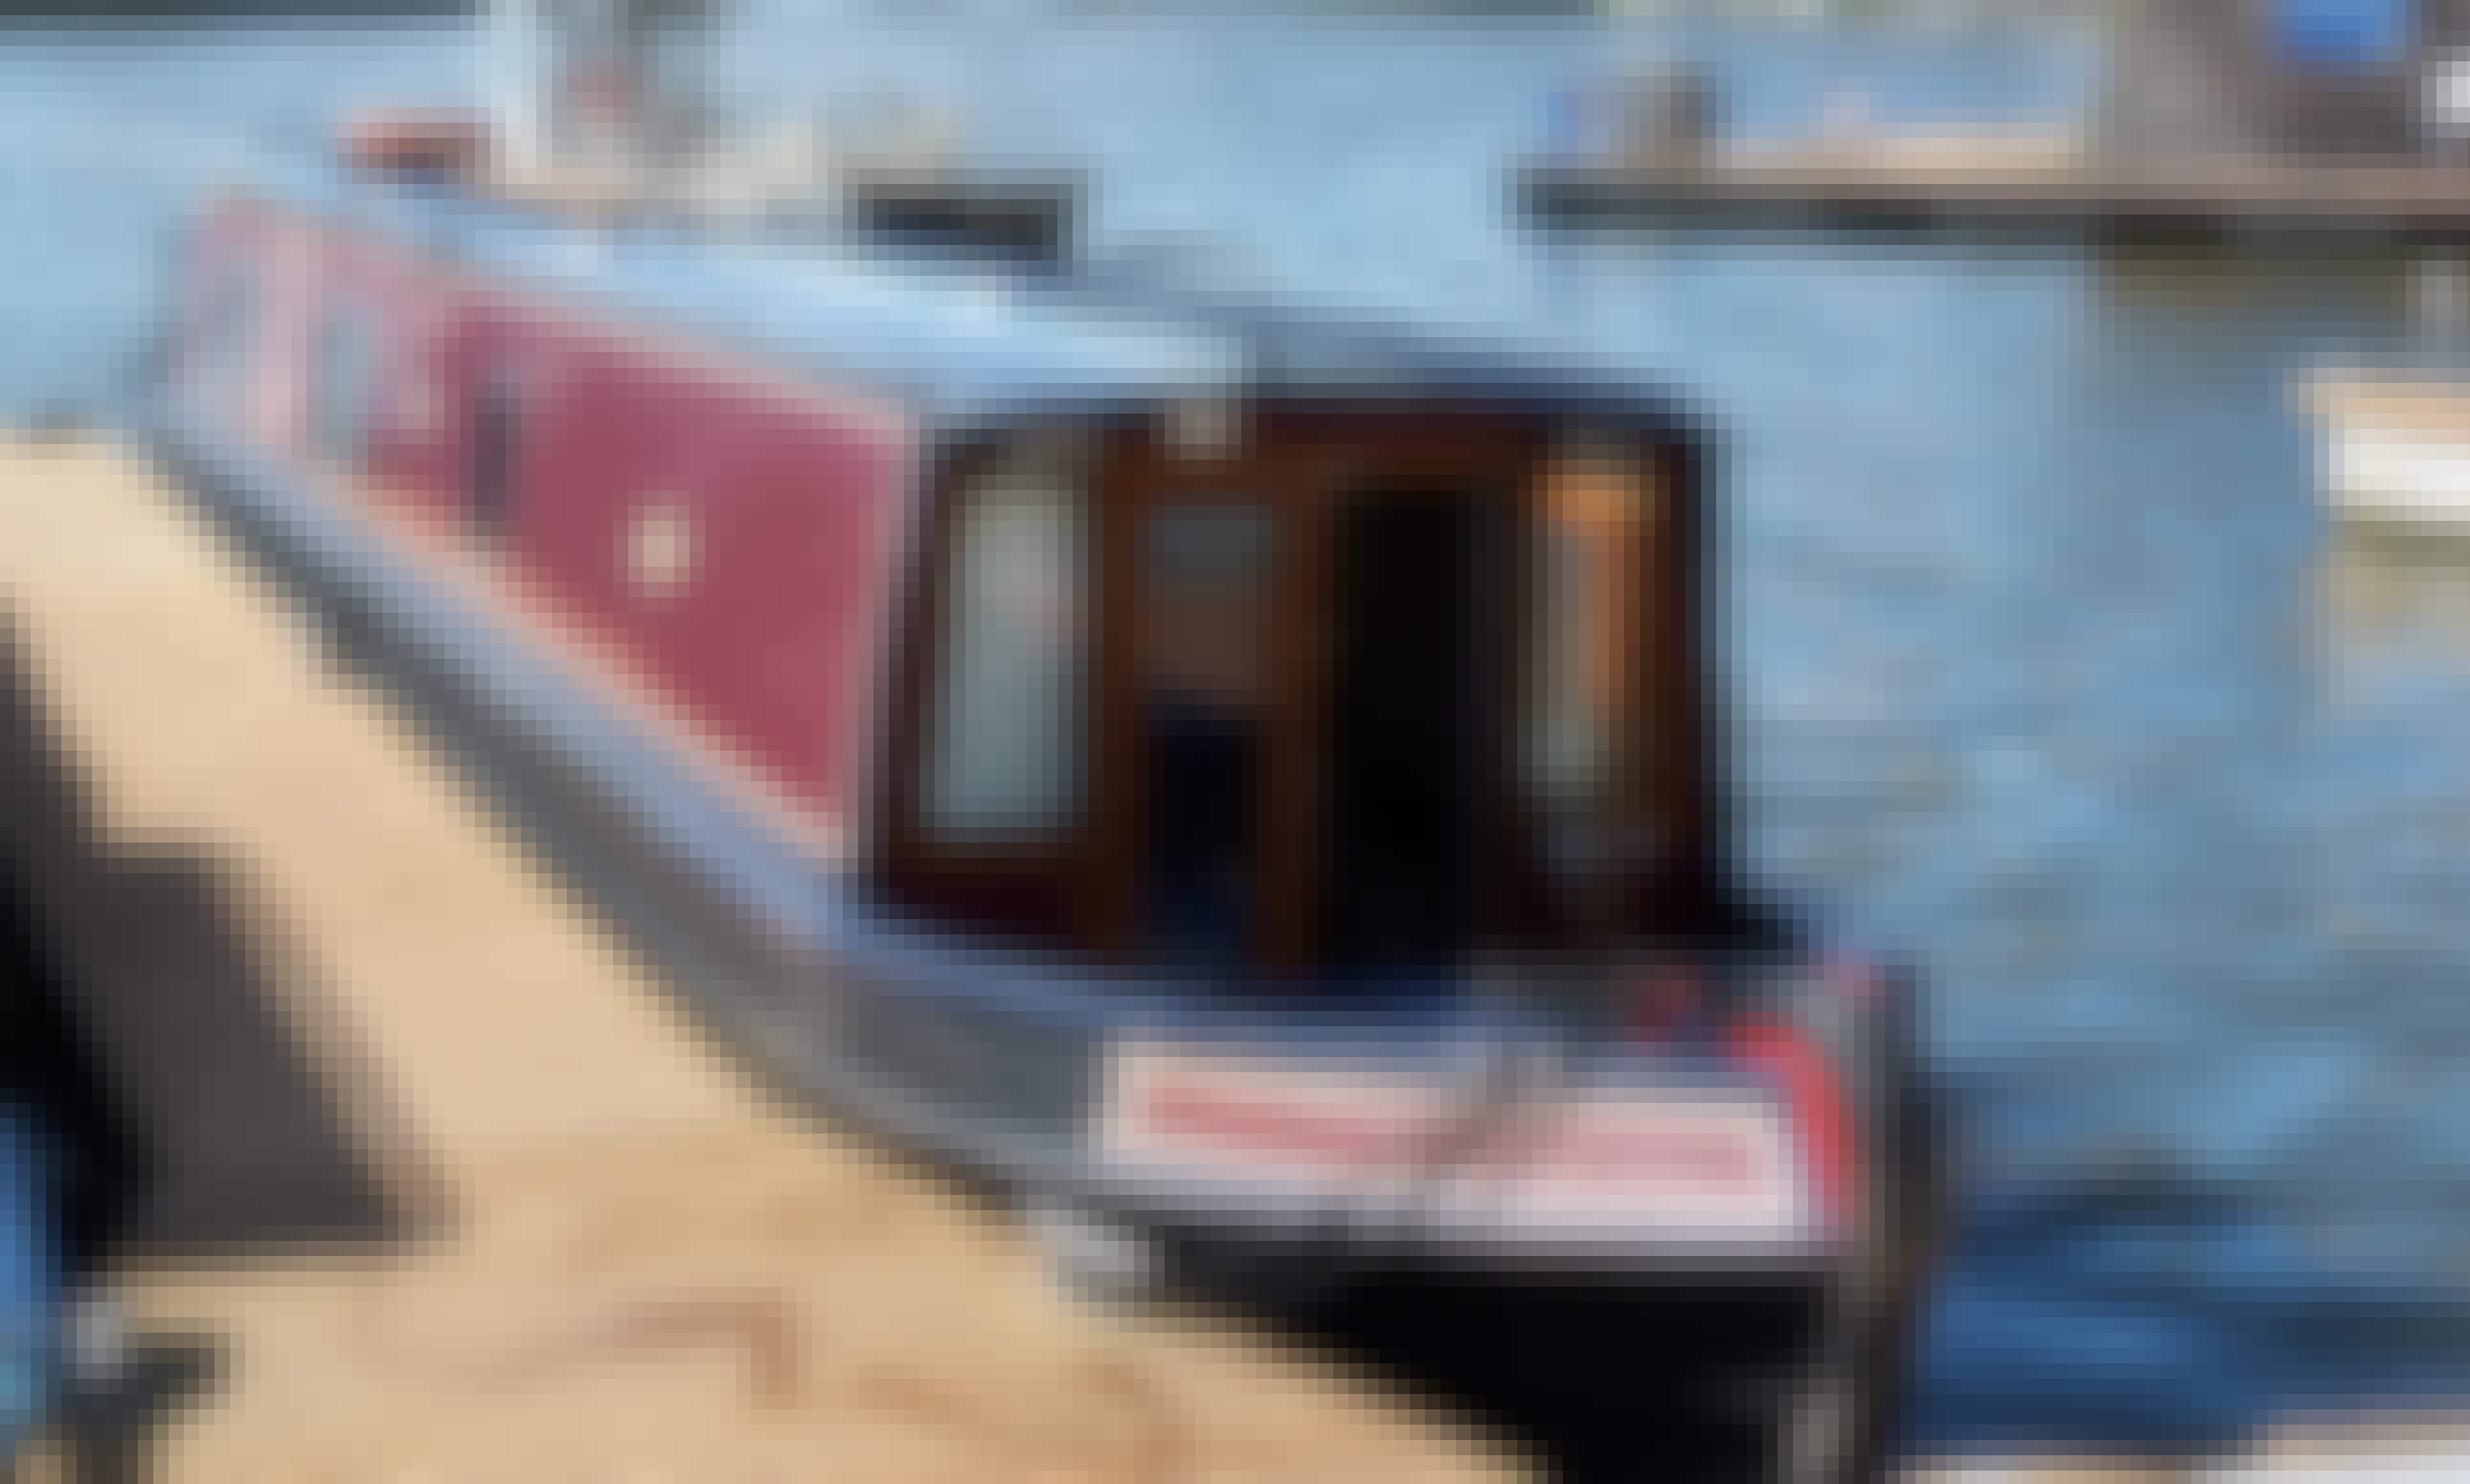 Houseboat Rental in Stoke on Trent (Peak District) / Narrowboat D2